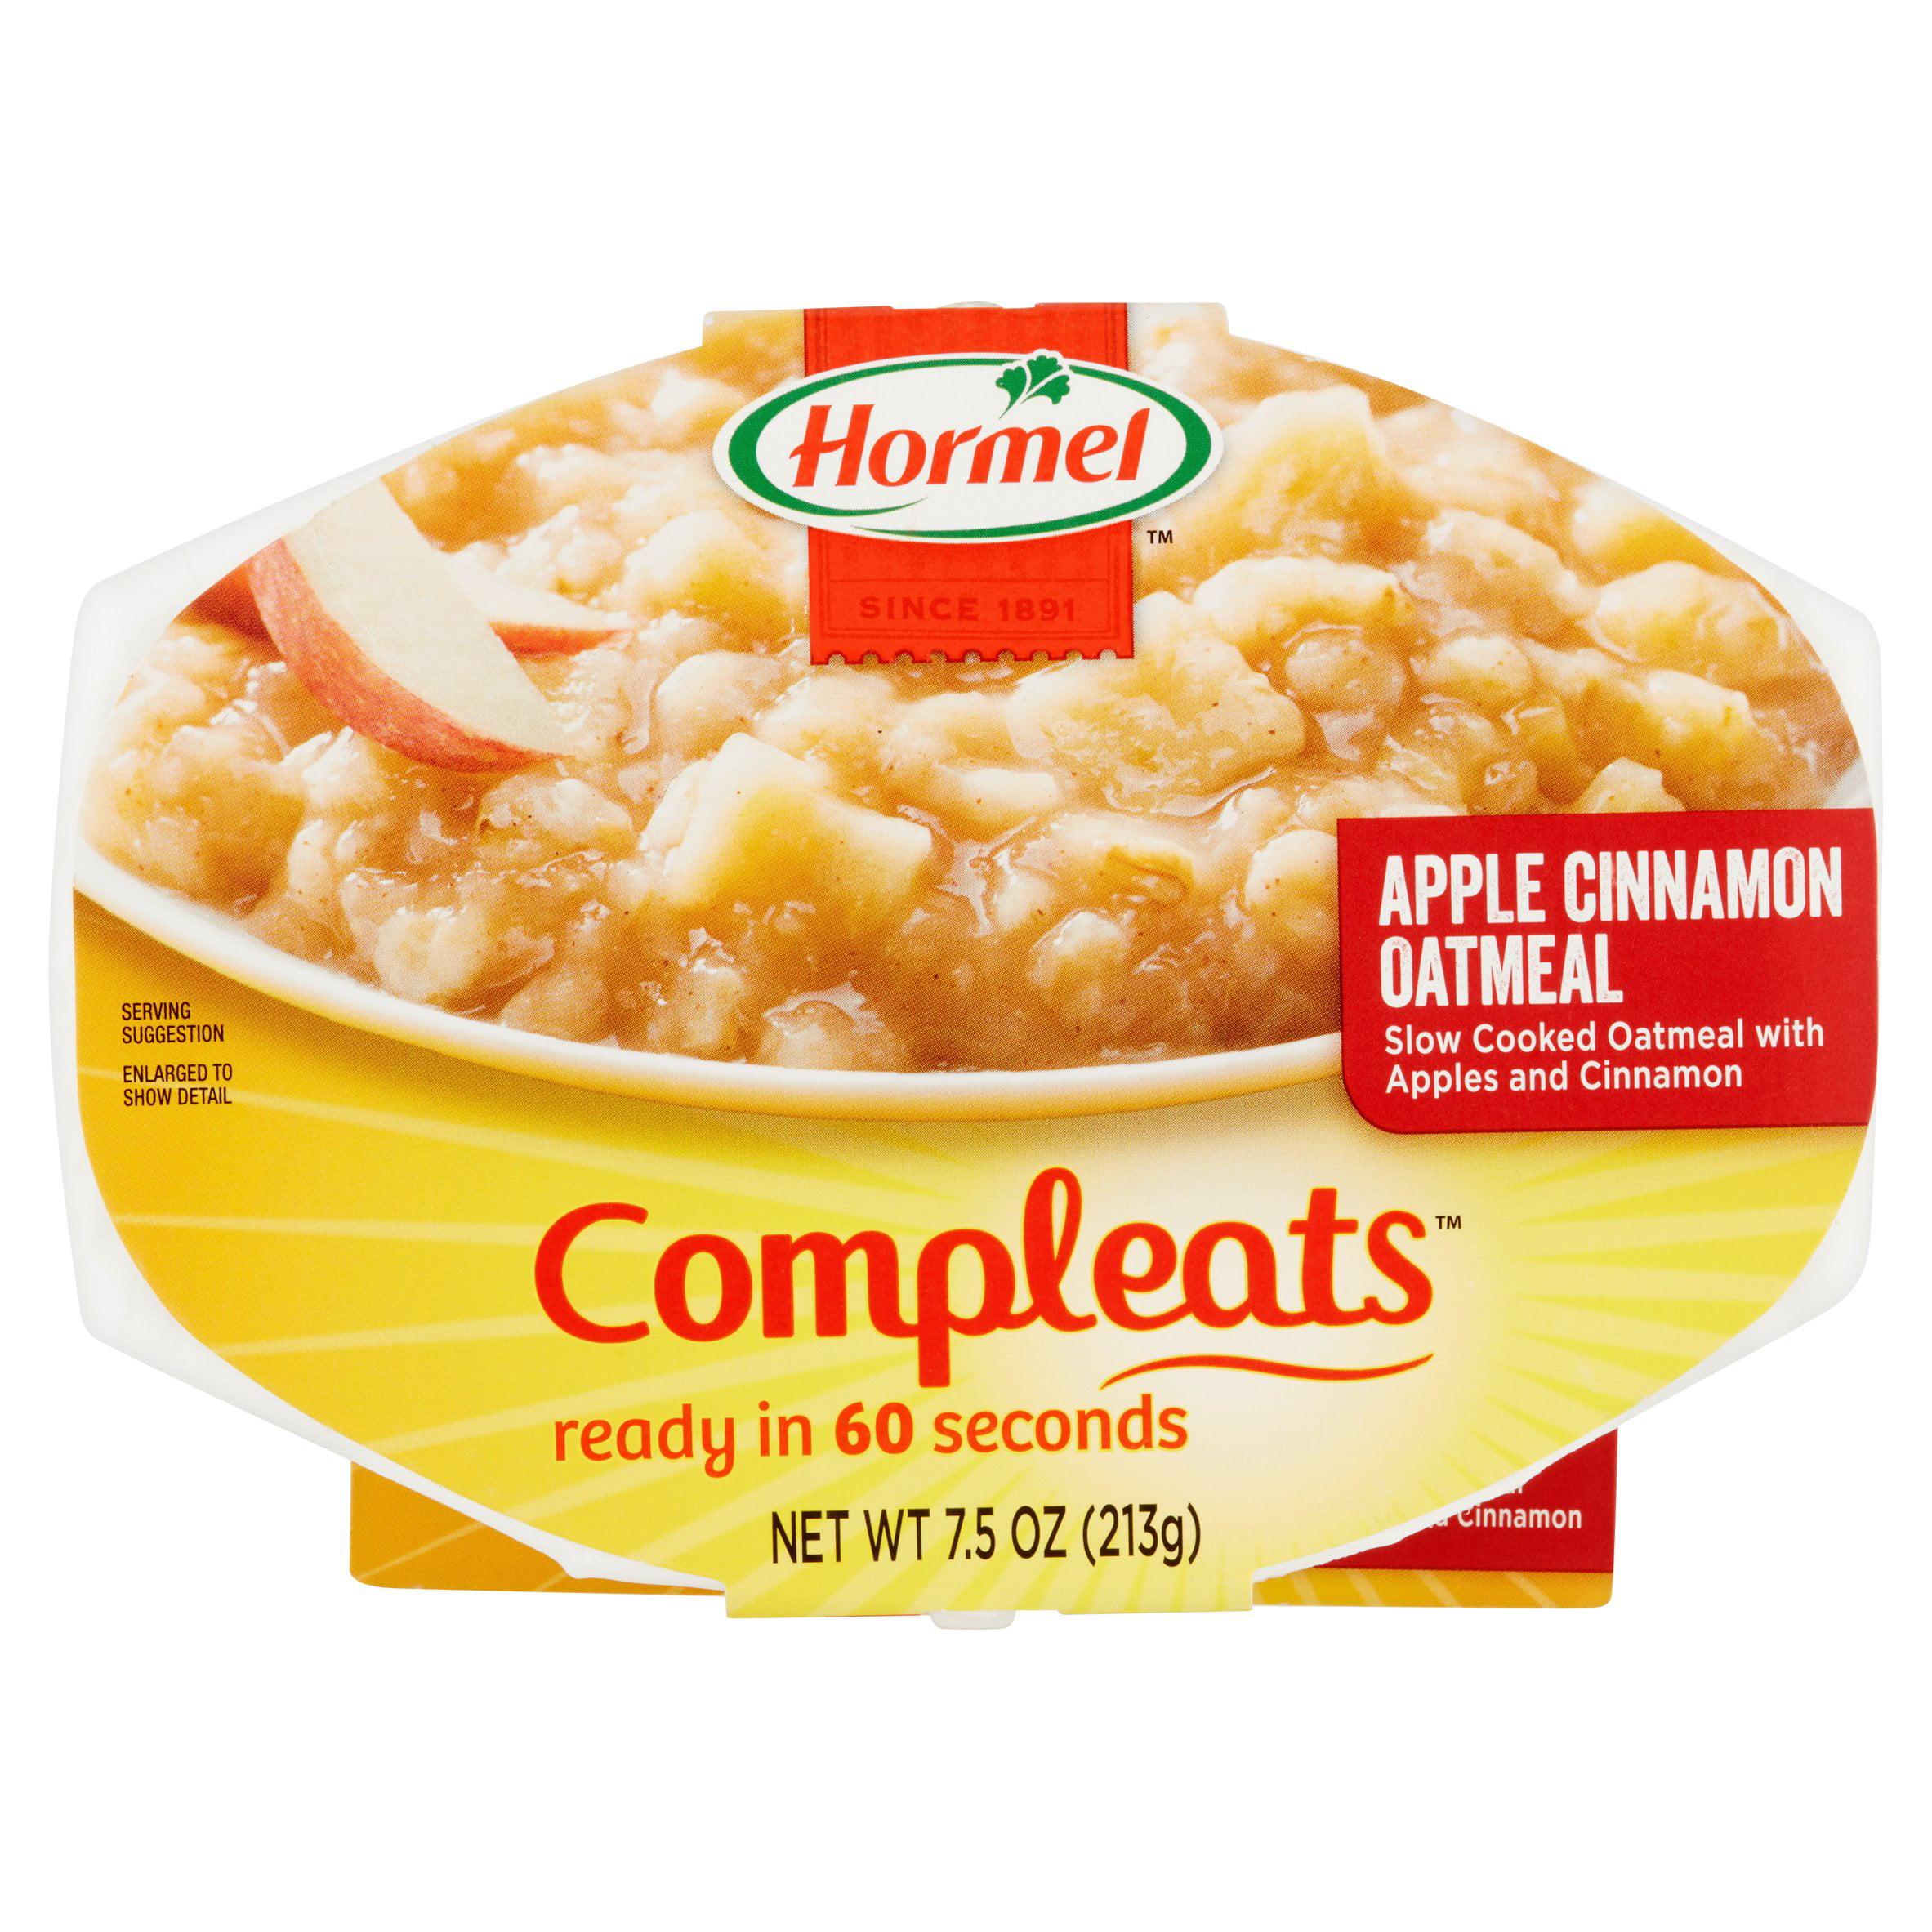 HORMEL; COMPLEATS; Good Mornings Apple Cinnamon Oatmeal 7.5 oz. Bowl